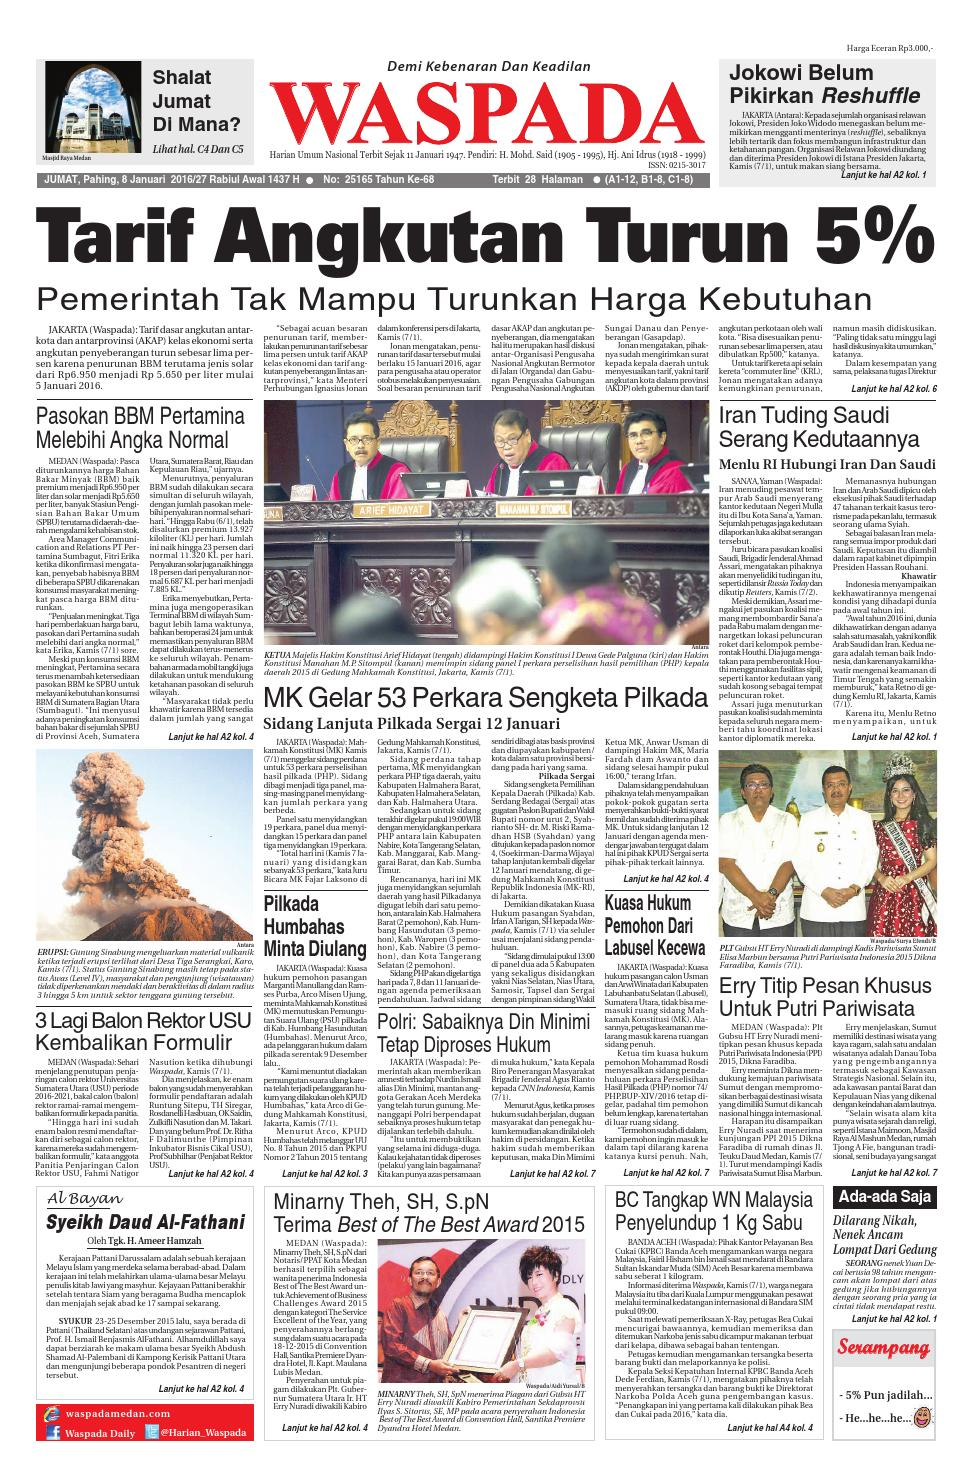 Gallery Waspada, jumat 10 januari 10 by Harian Waspada   issuu is free HD wallpaper.